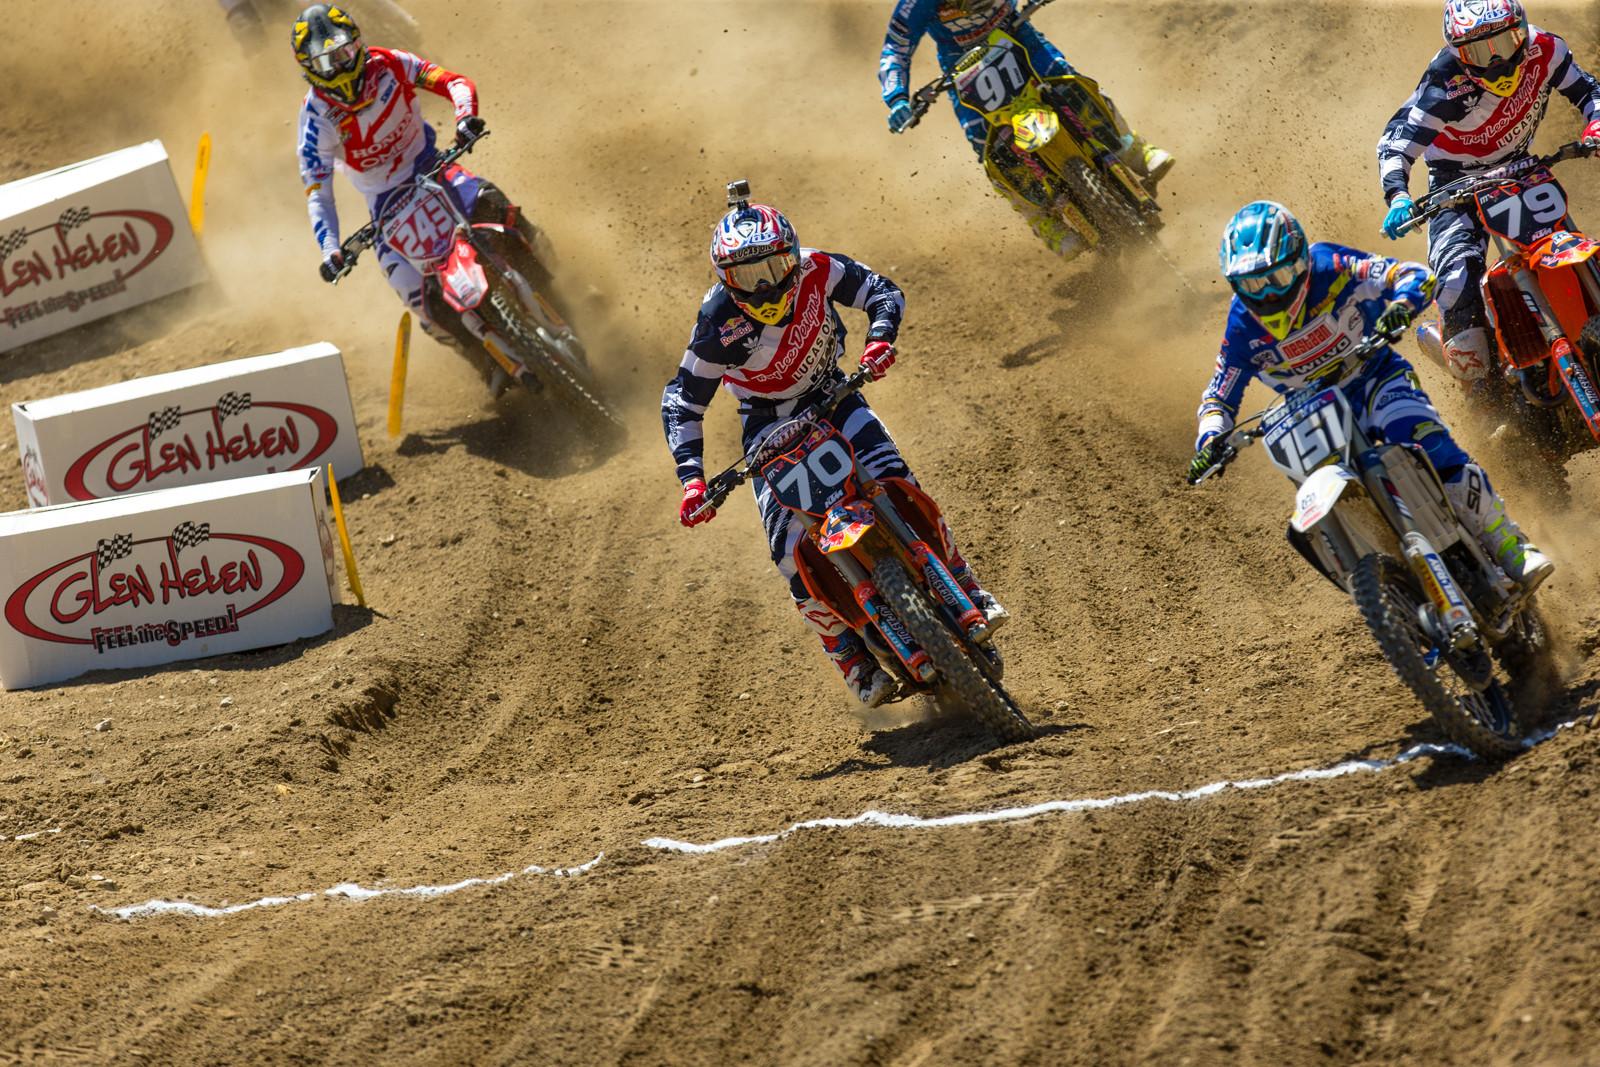 Photo Blast: MX2 moto one start - Photo Blast: MXGP of the USA - Motocross Pictures - Vital MX